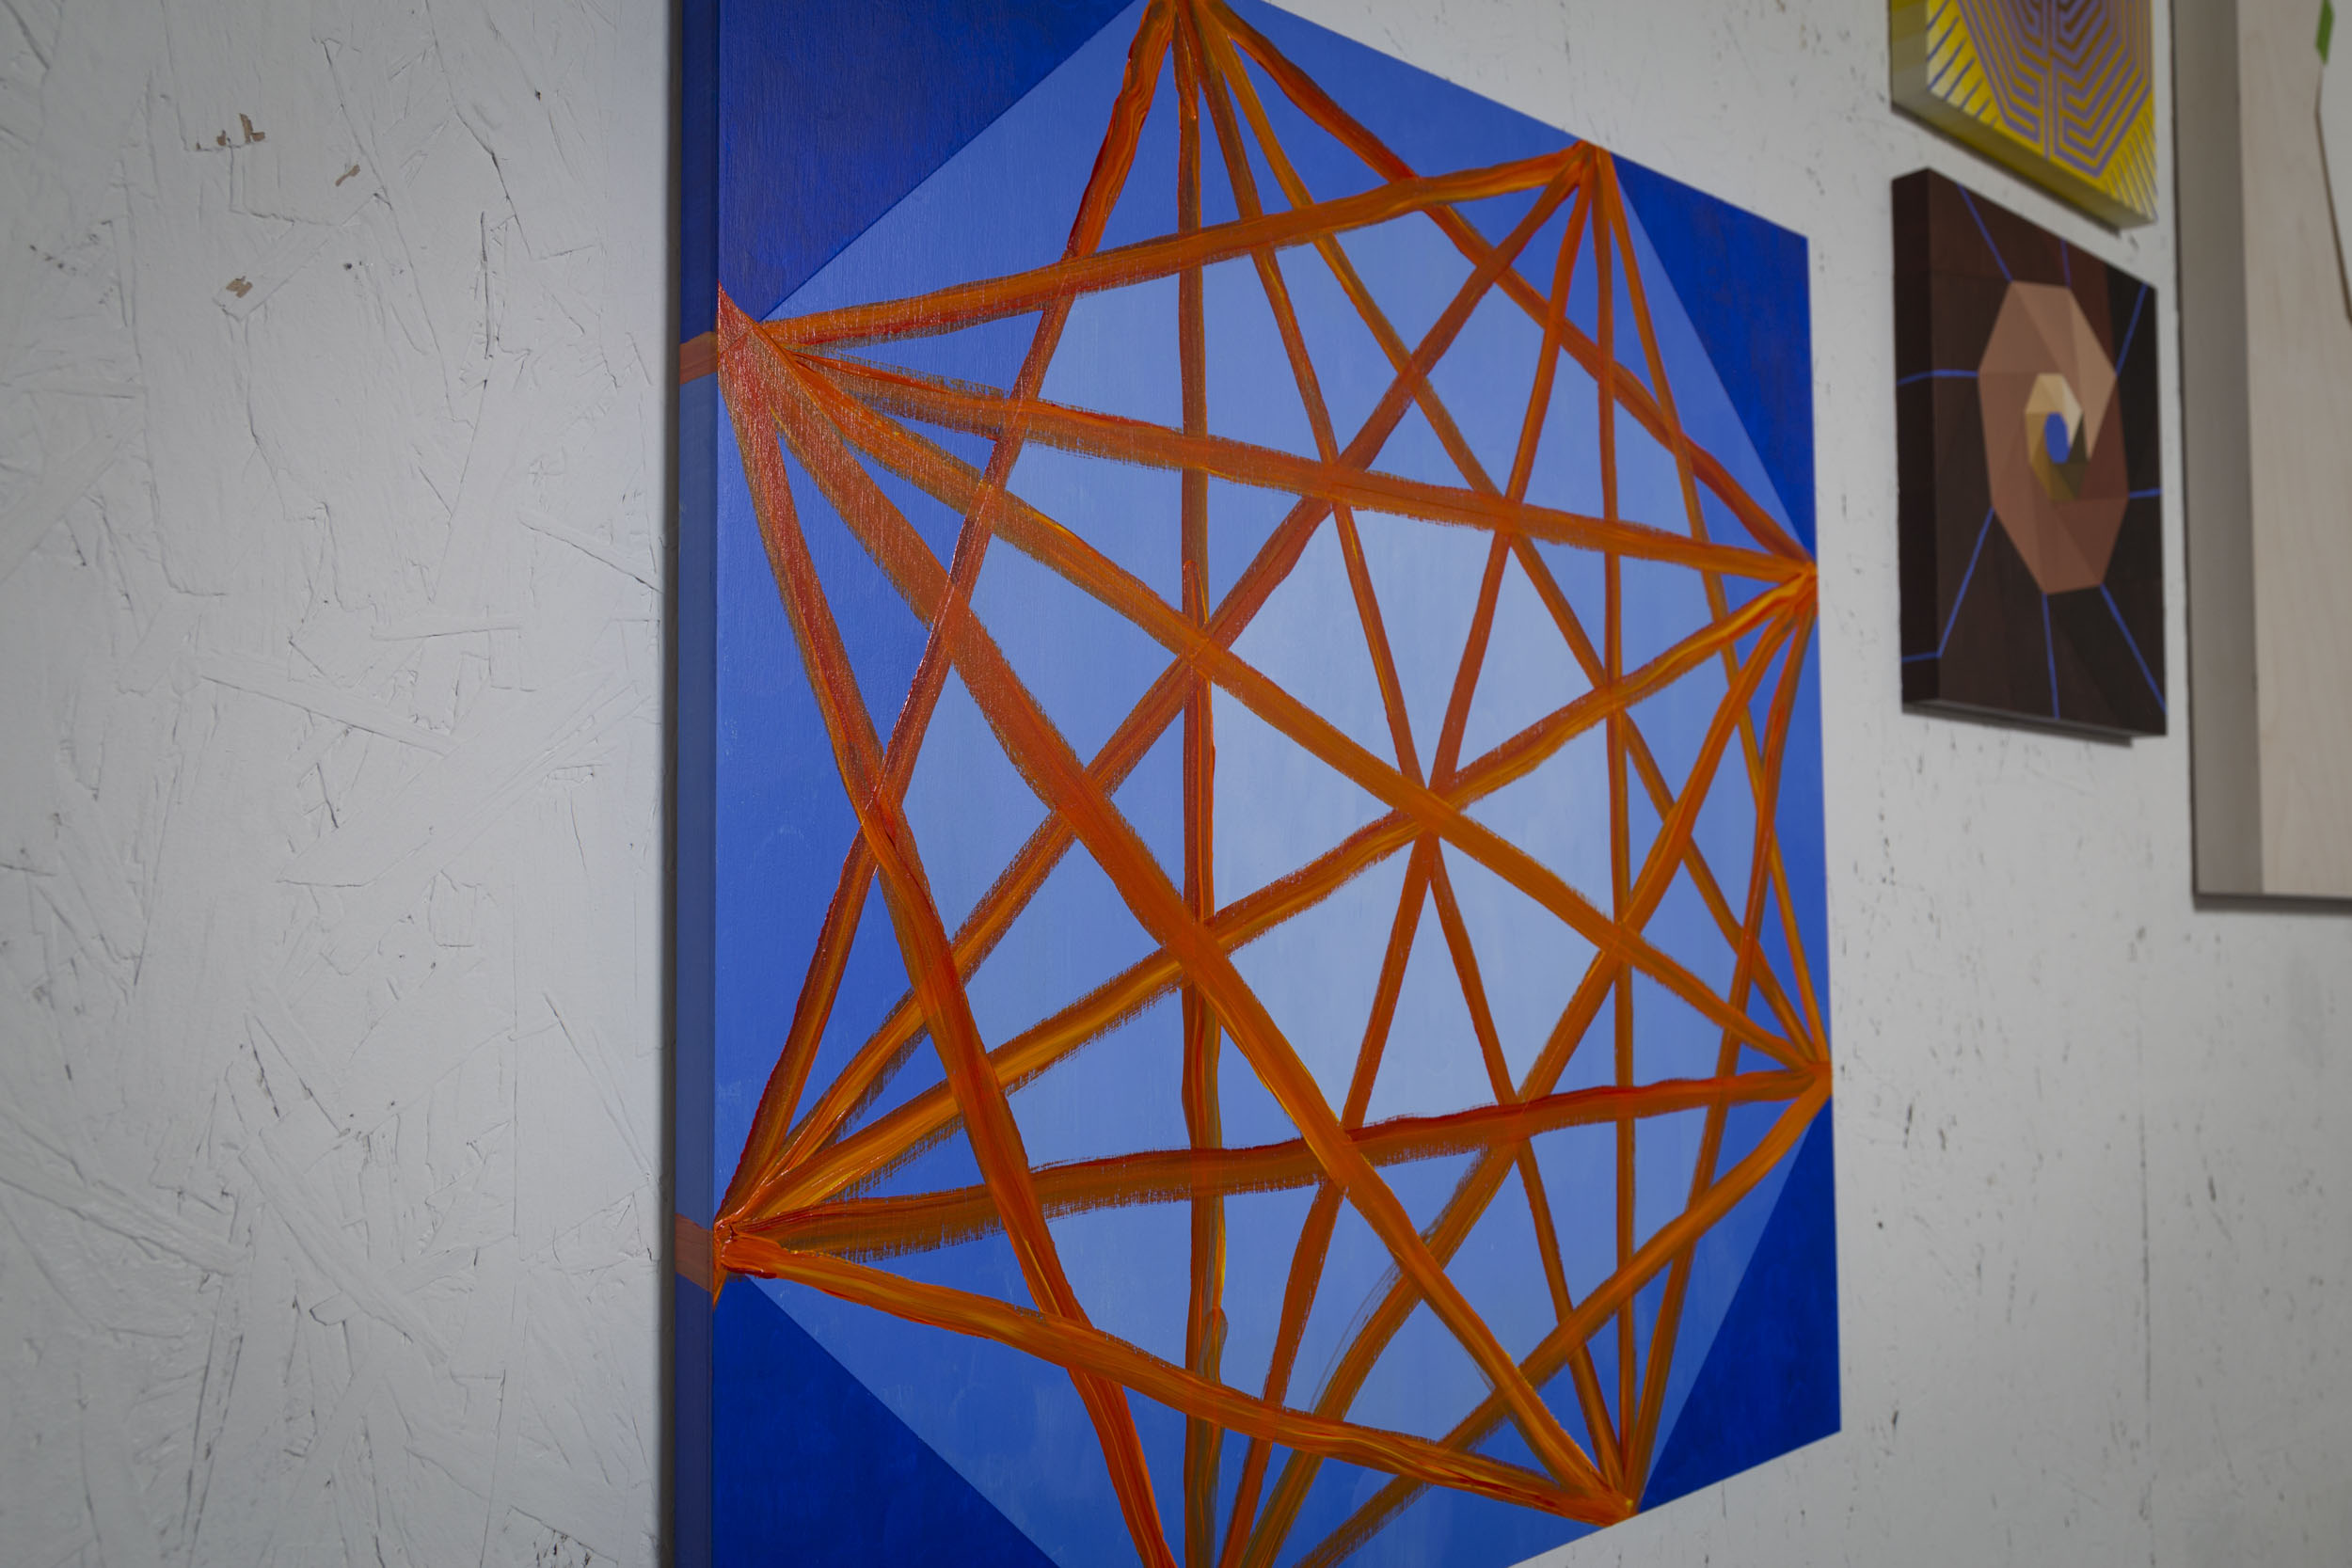 wassaic-project-artist-amber-heaton-2018-07-25-16-46-13.jpg